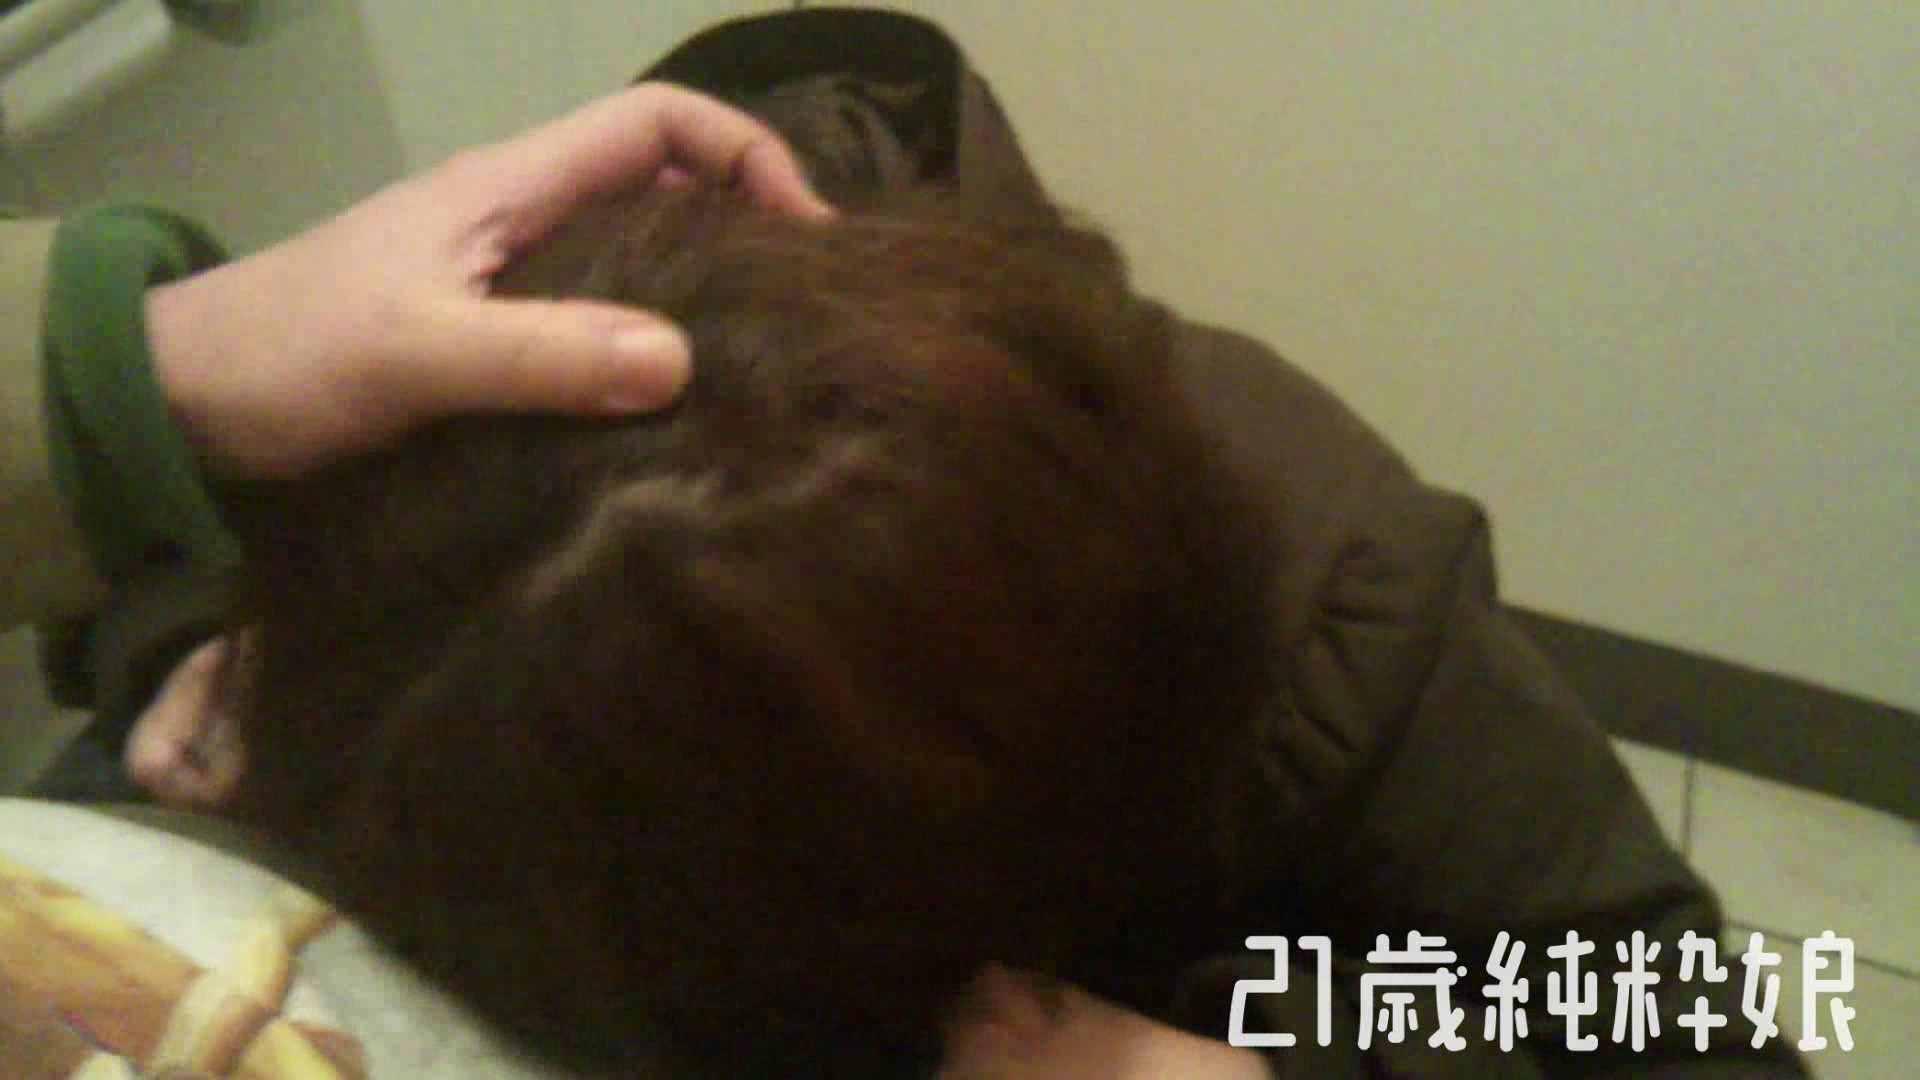 Gカップ21歳純粋嬢第2弾Vol.5 OLヌード天国 | 学校  110PIX 61